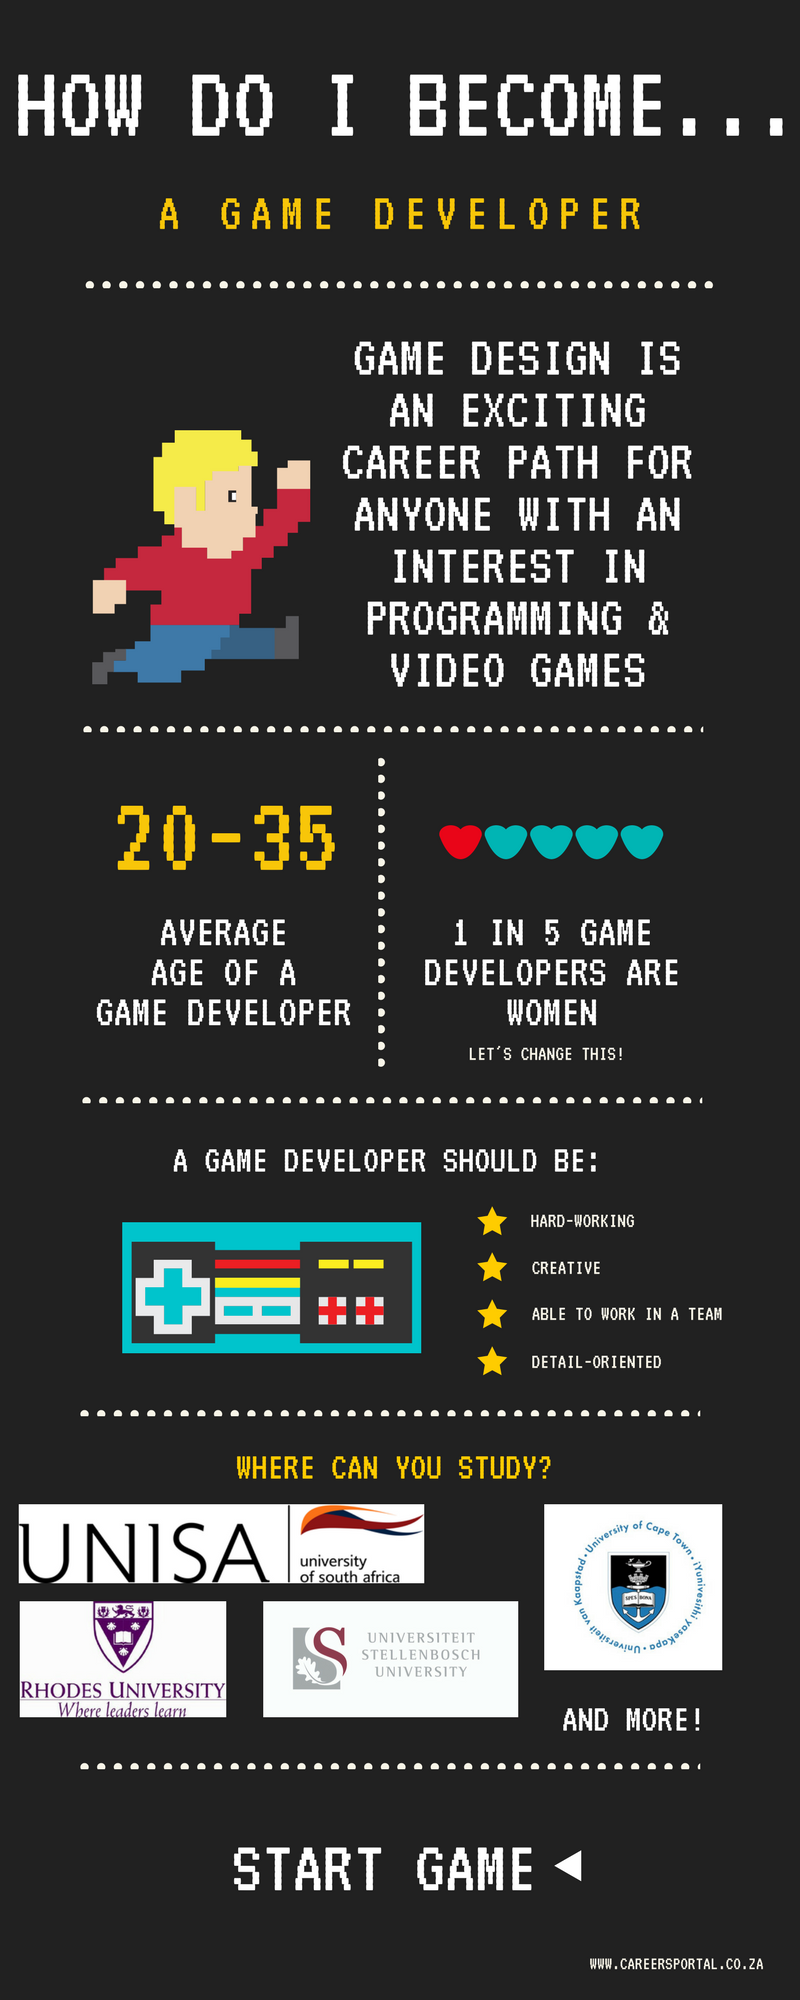 How to become a video game designer ‐ CareerExplorer